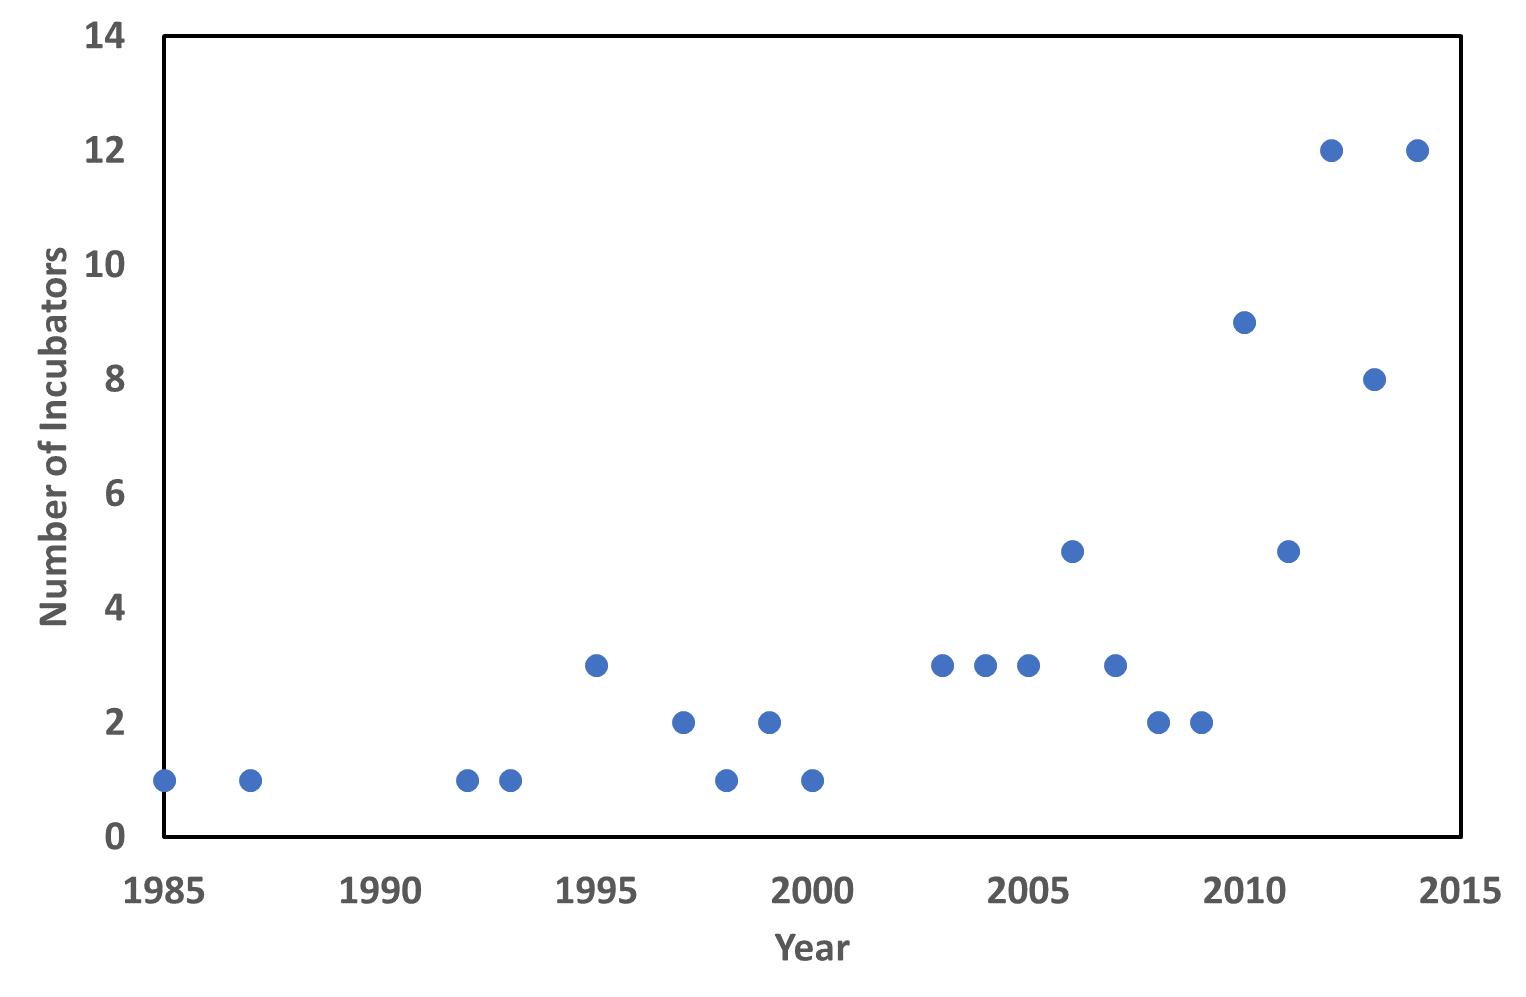 Number of bio-incubators USA and Europe